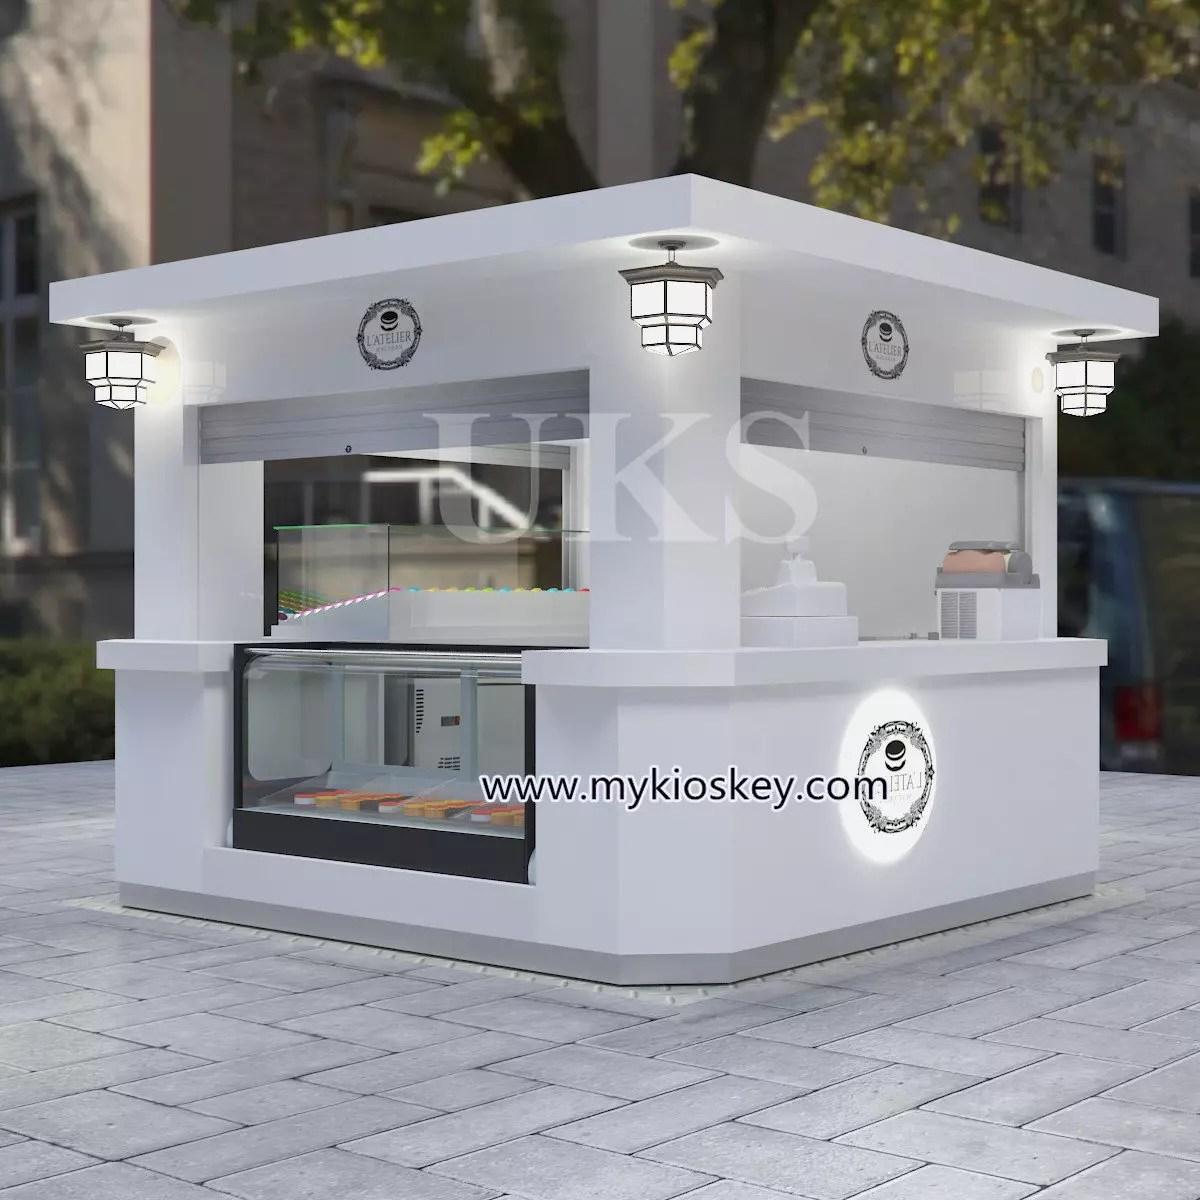 1010ft Elegant Macaron Outdoor Kiosk Design In Hot Sale